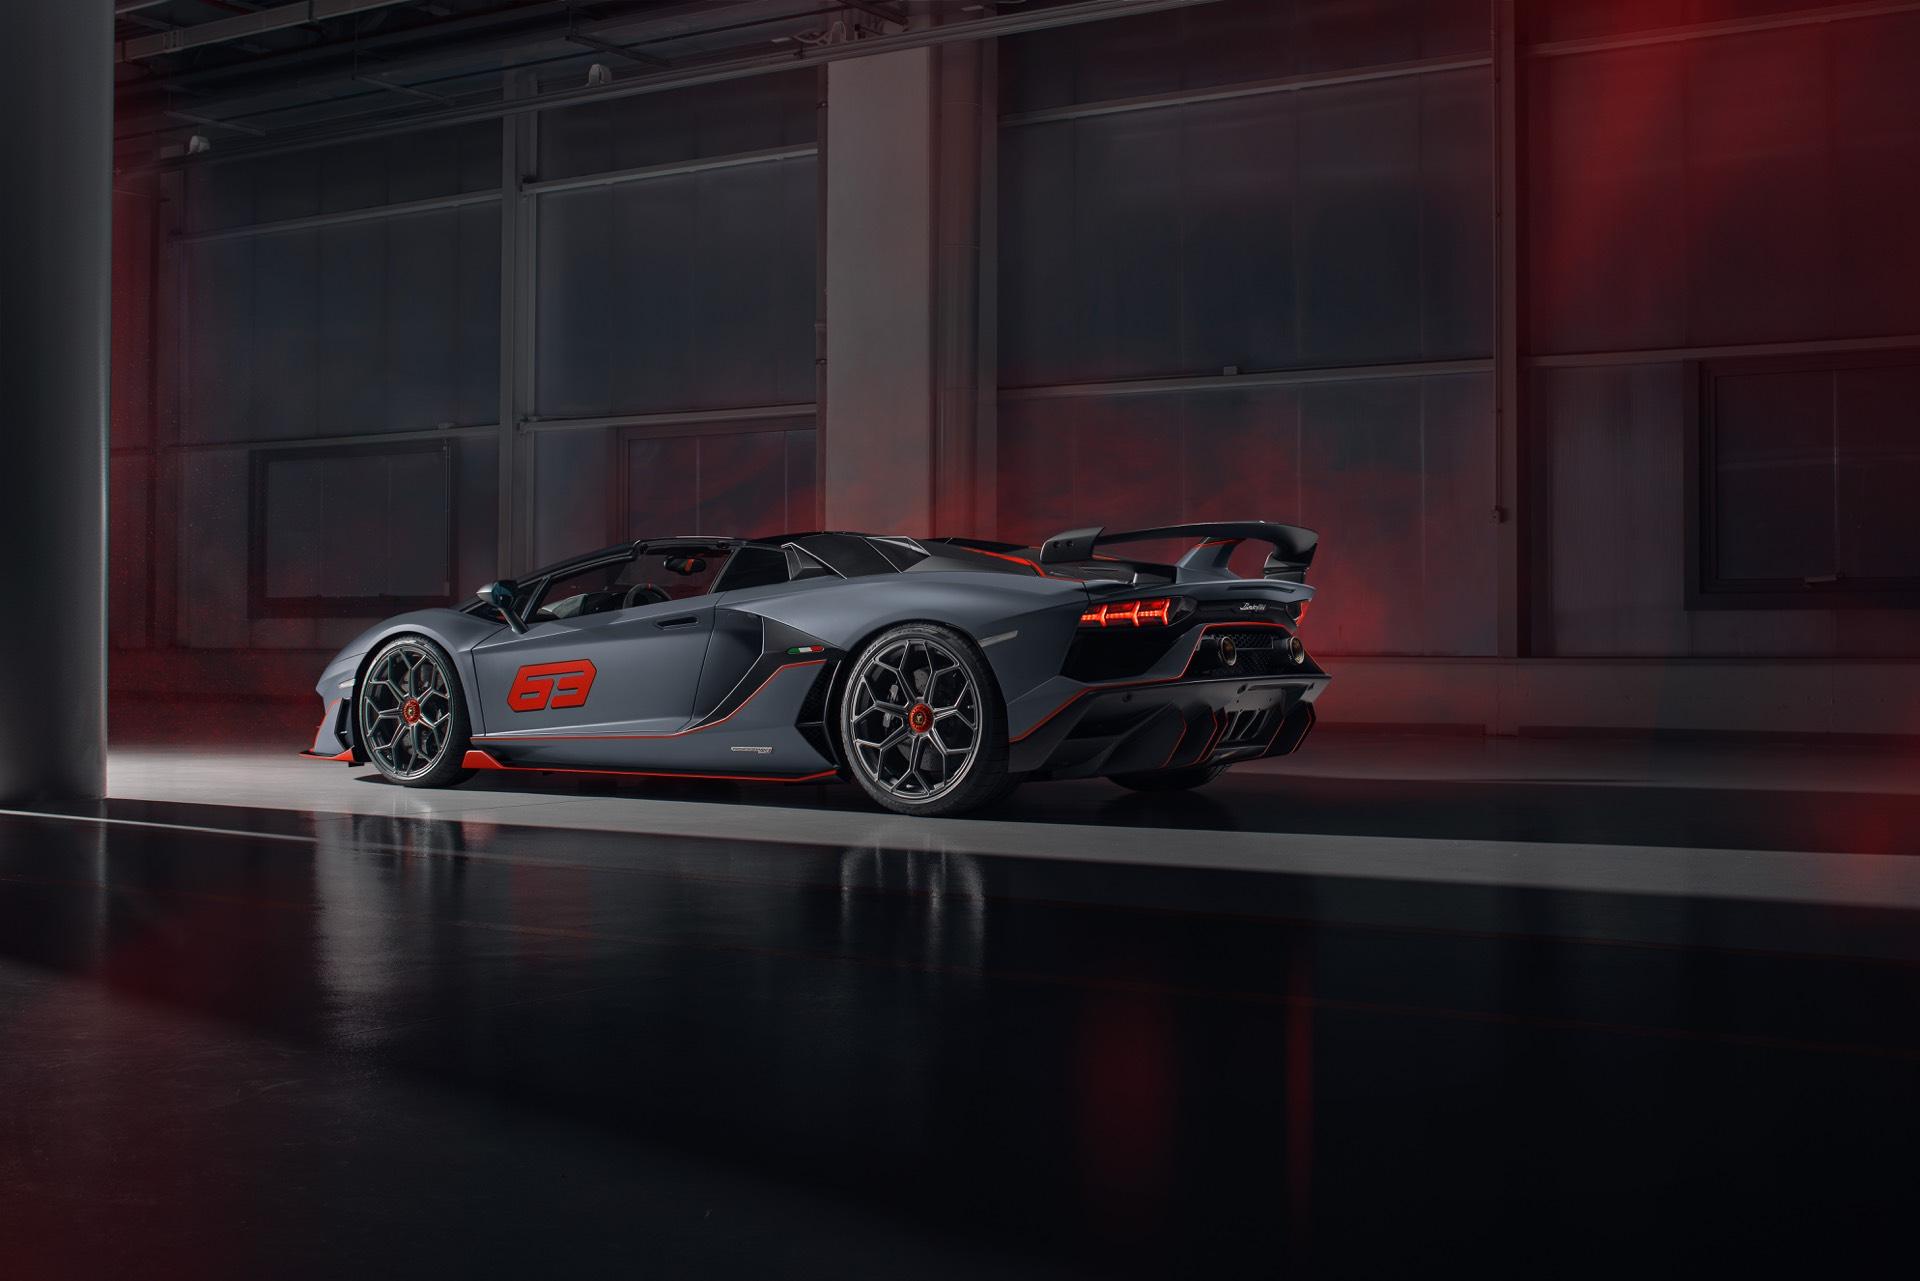 Lamborghini Aventador SVJ 63 Roadster